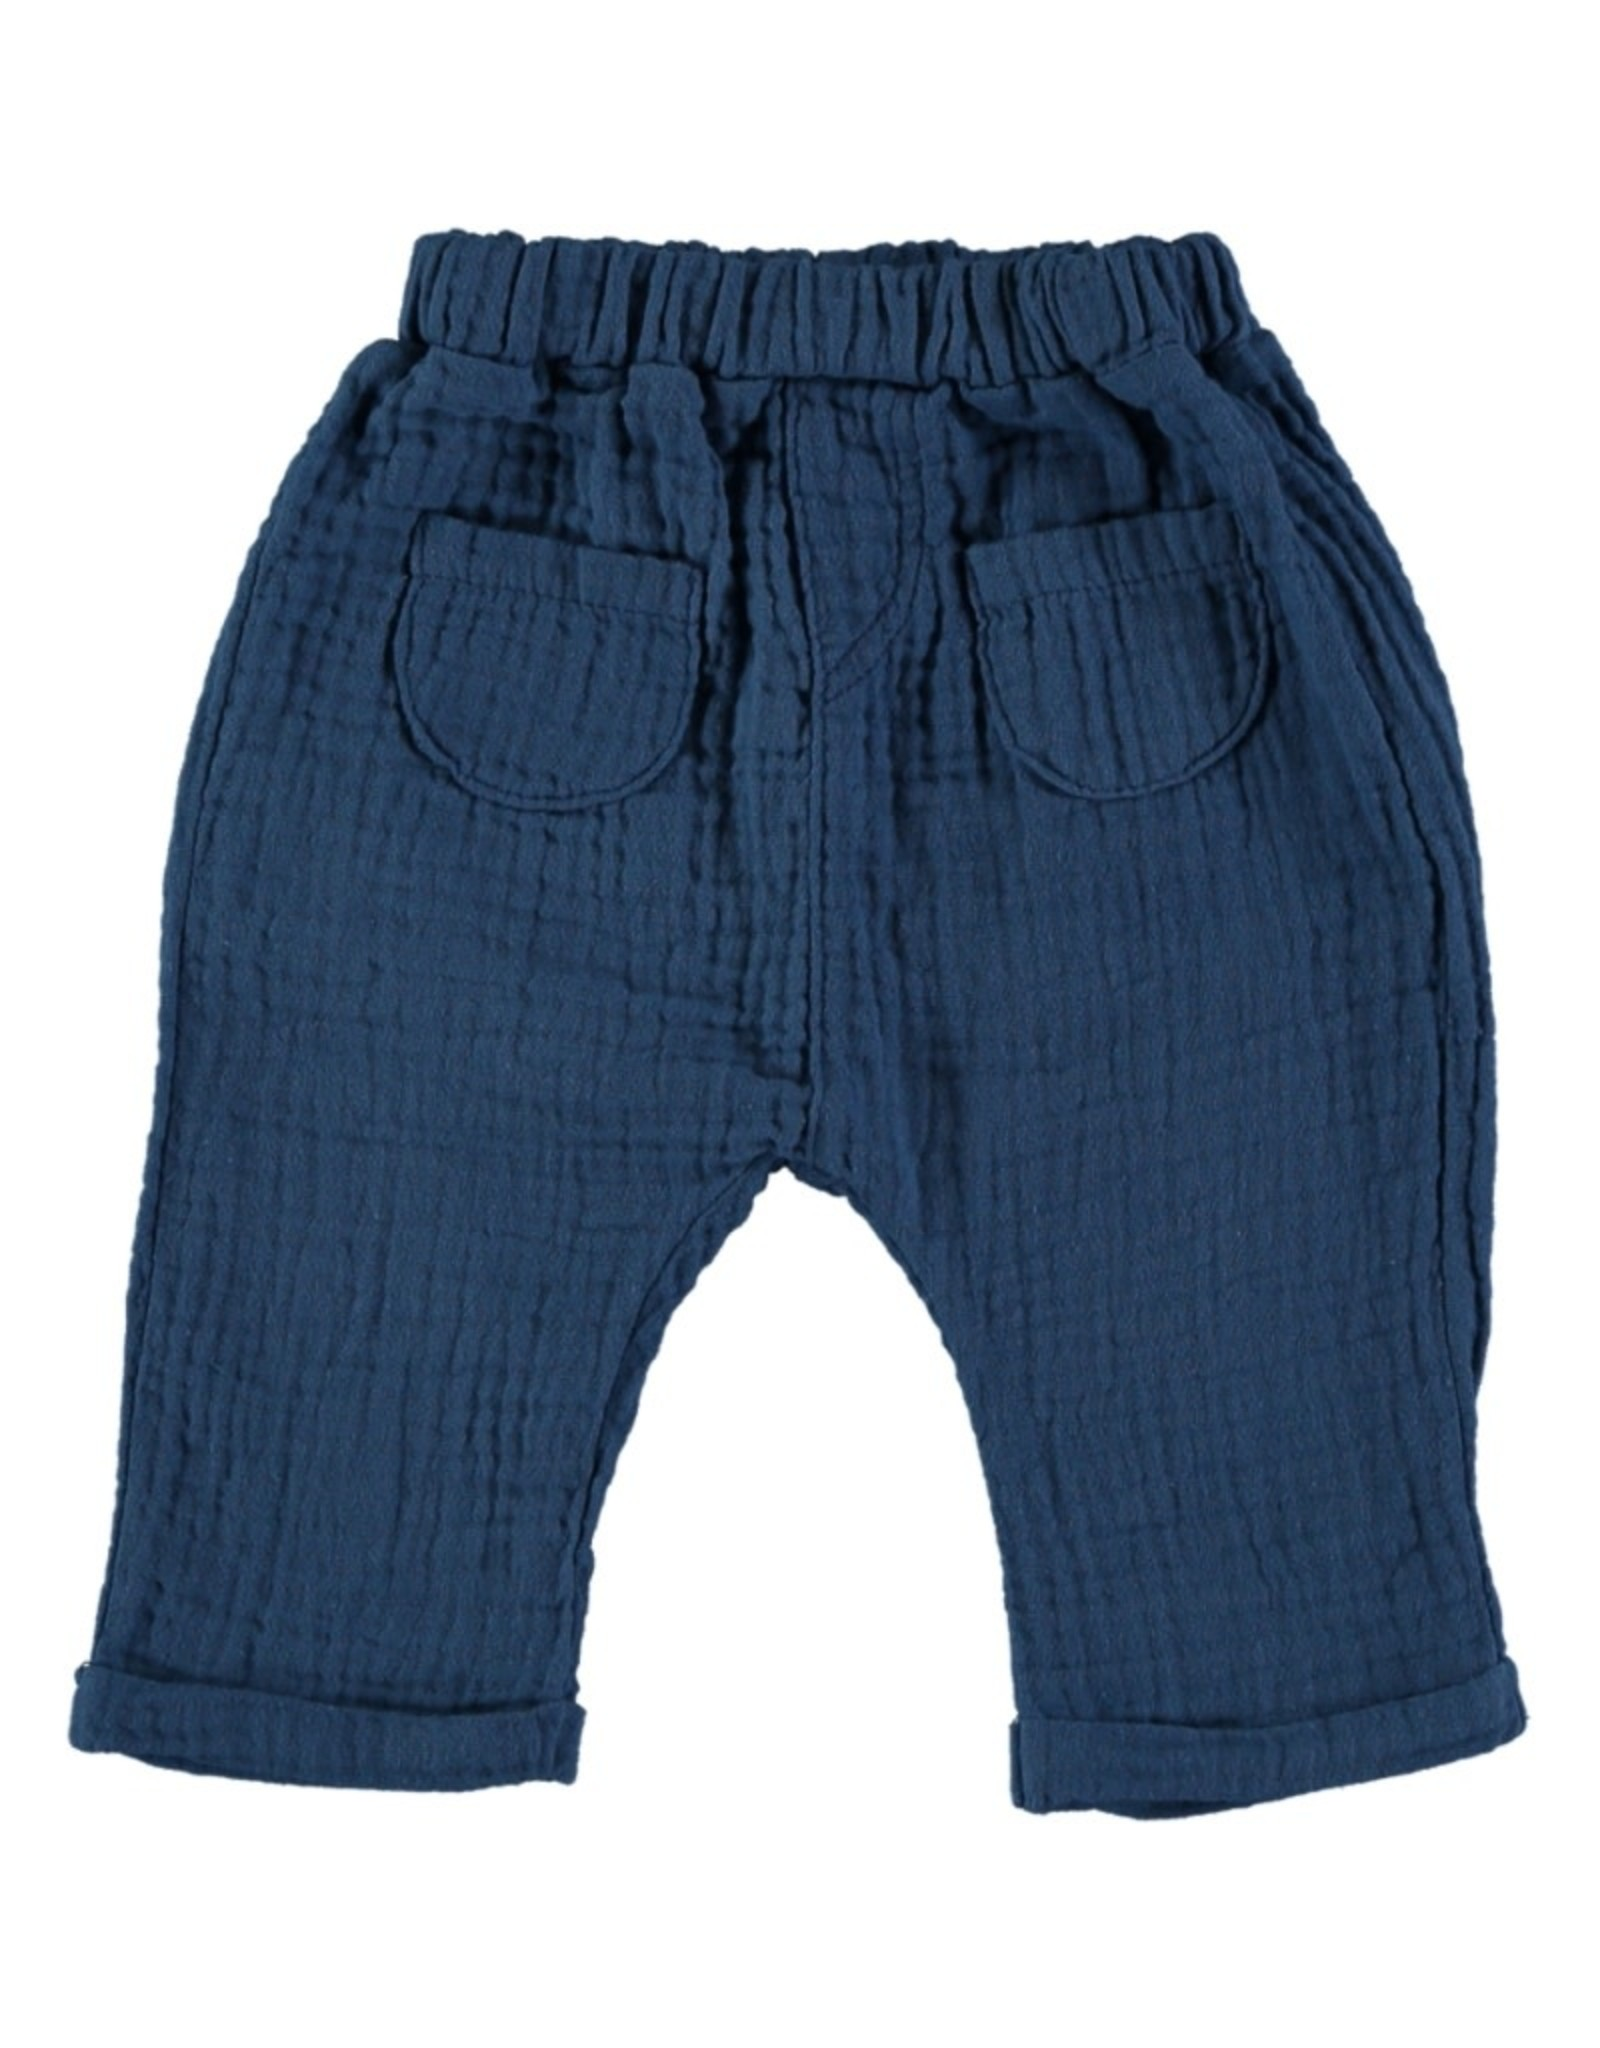 Beans Barcelona Beans Barcelona WAVES-Bambula Pants With Pockets Blue